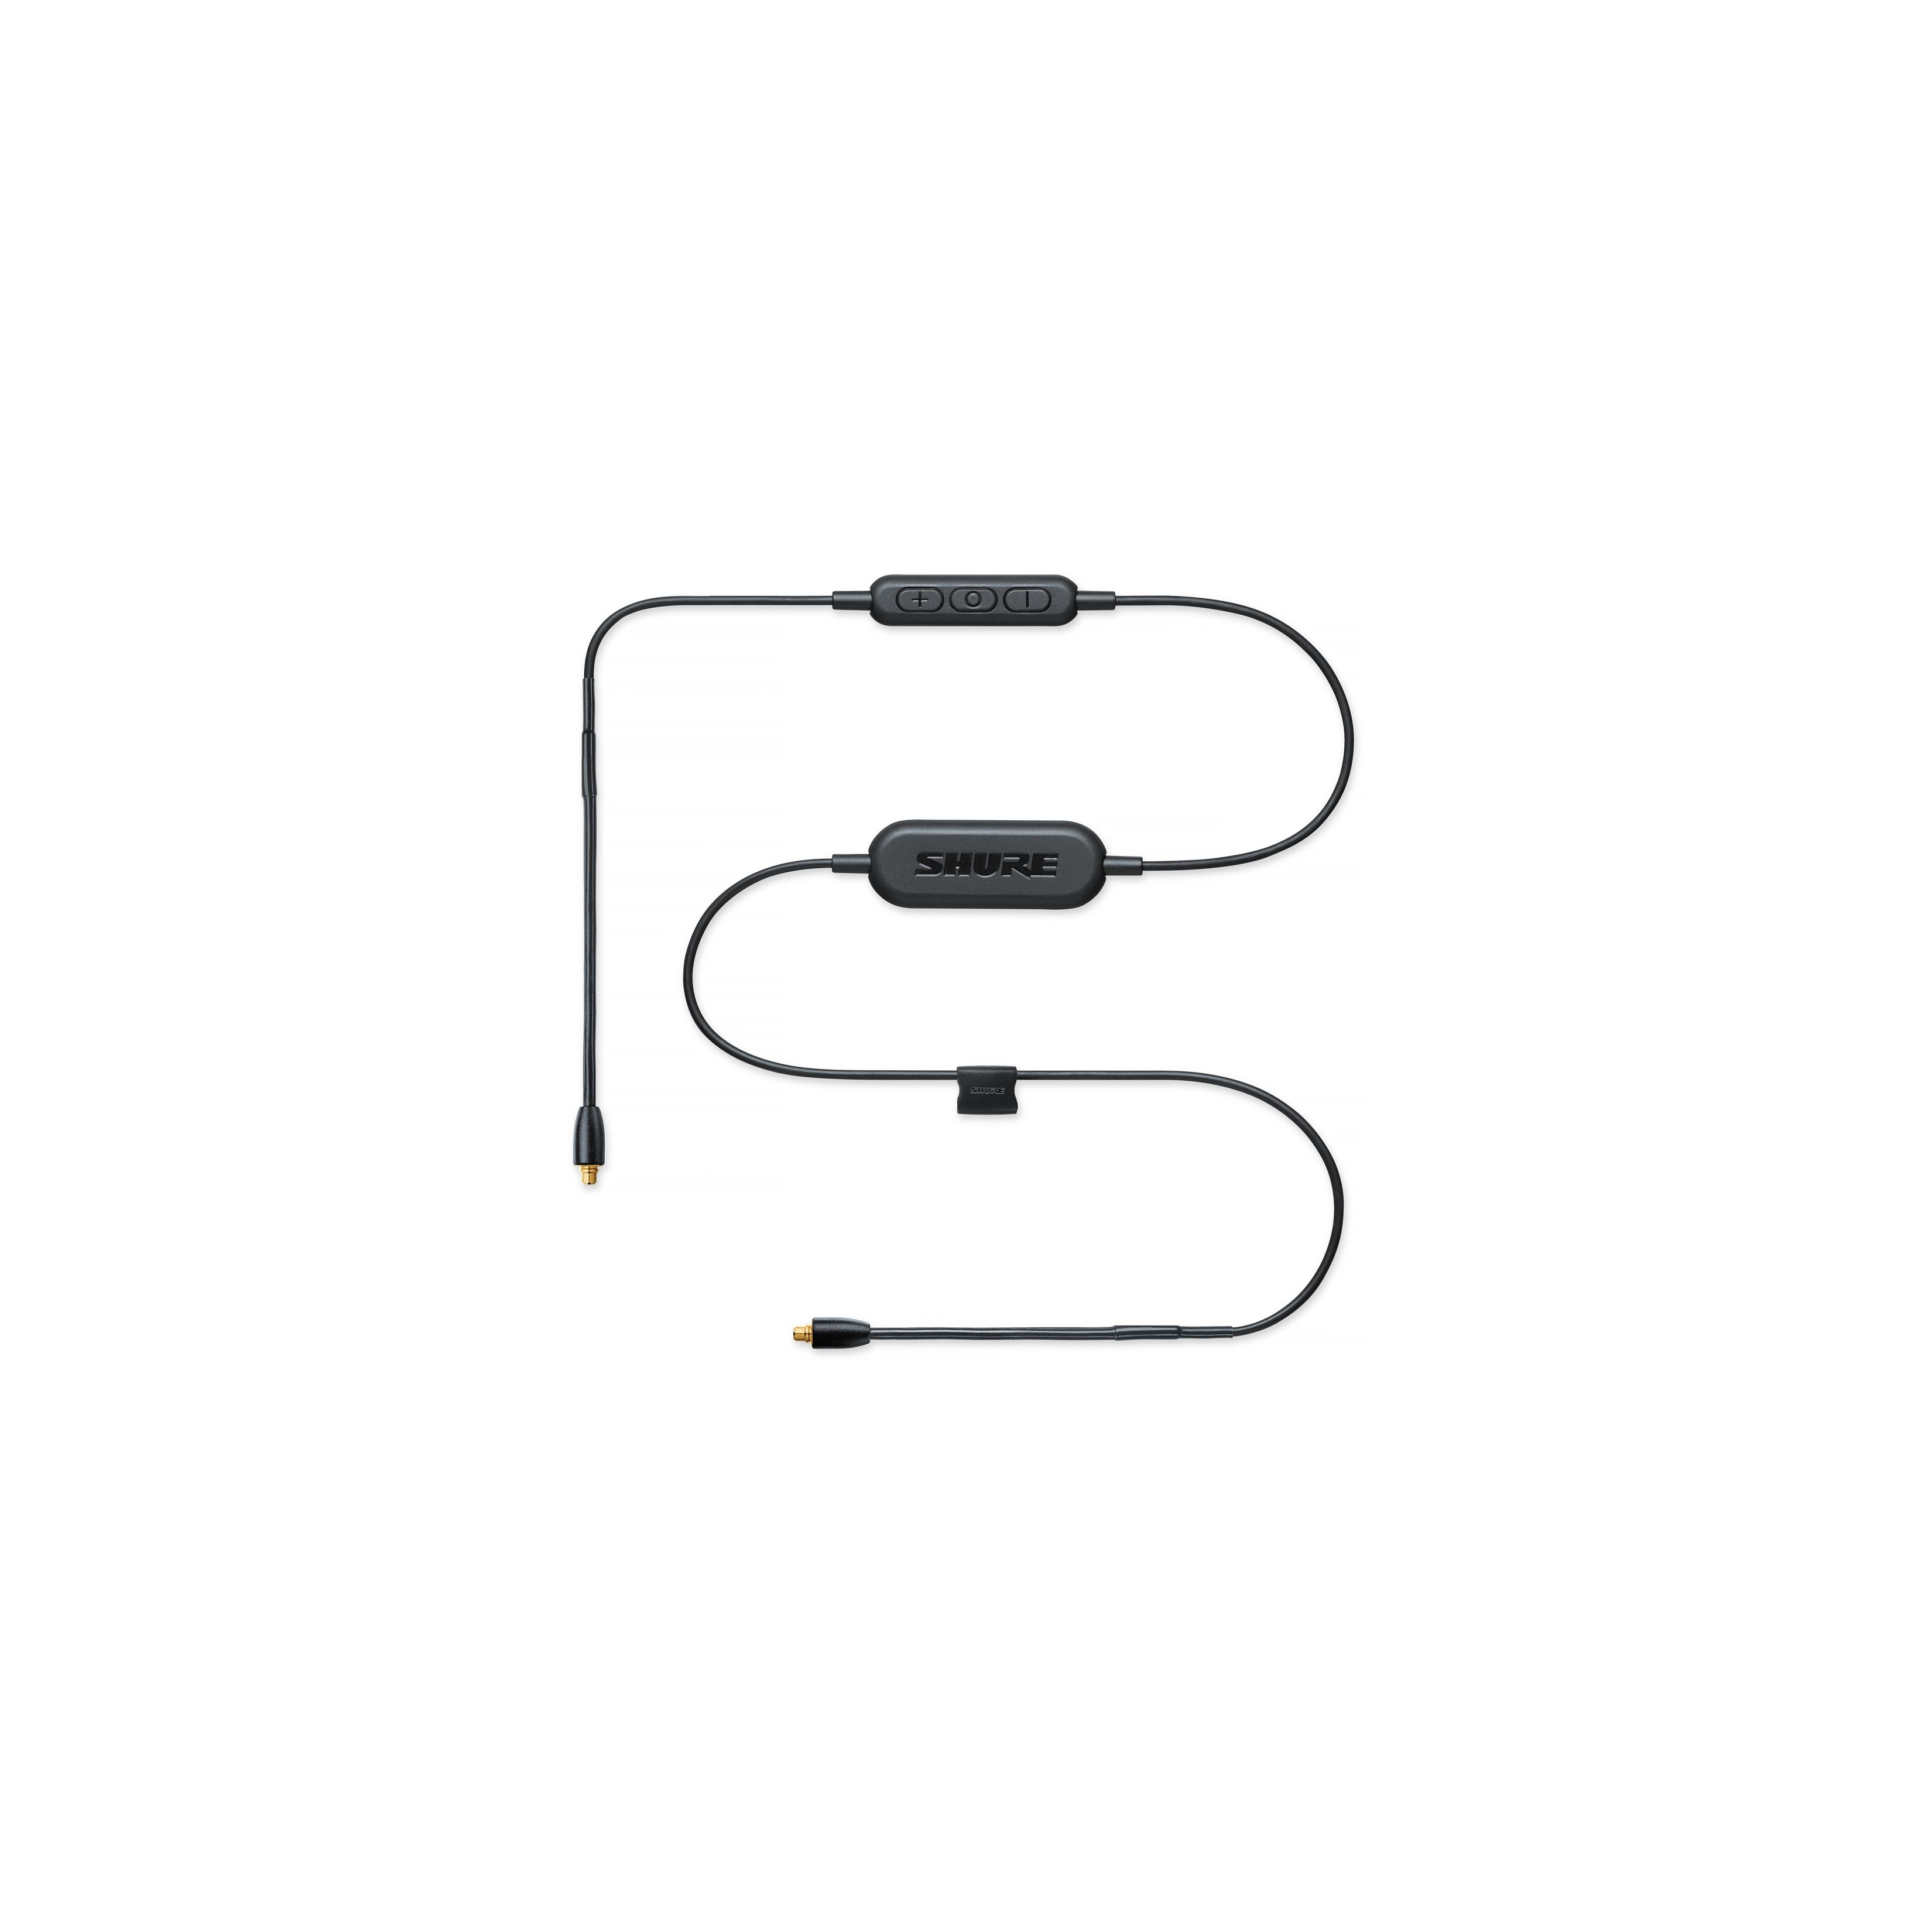 SHURE RMCE Remote Mic Cable iPhone for SE215 SE315 SE425 SE535 SE846 Headphones